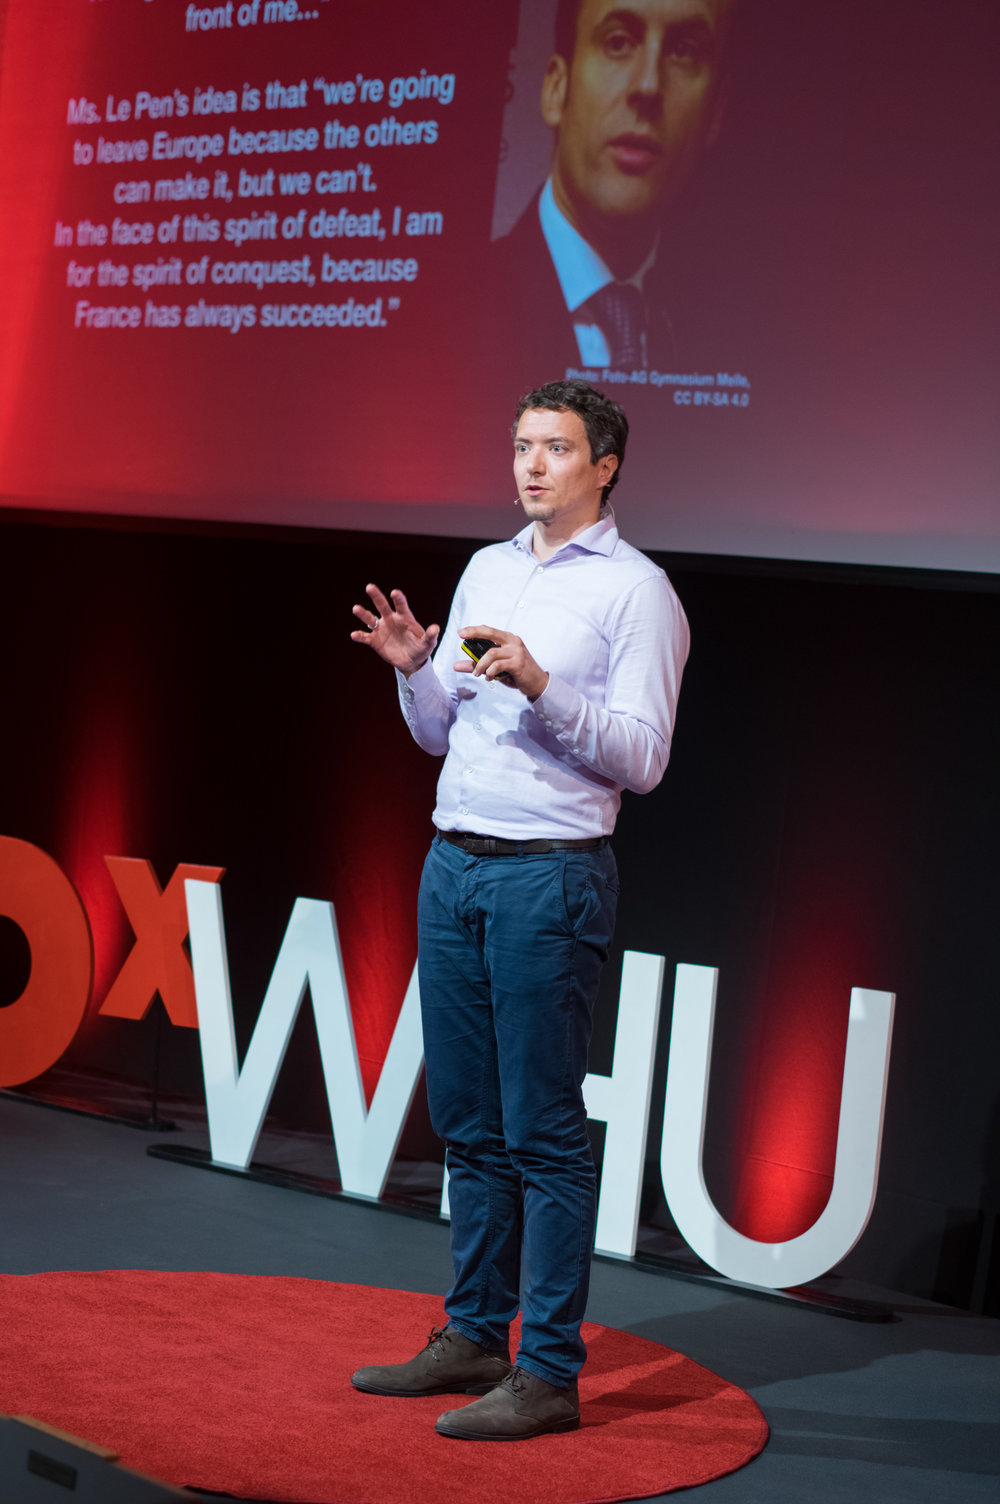 Christopher-Kabakis-TEDx-Talk-March-2018-Emmanuel-Macron.jpg